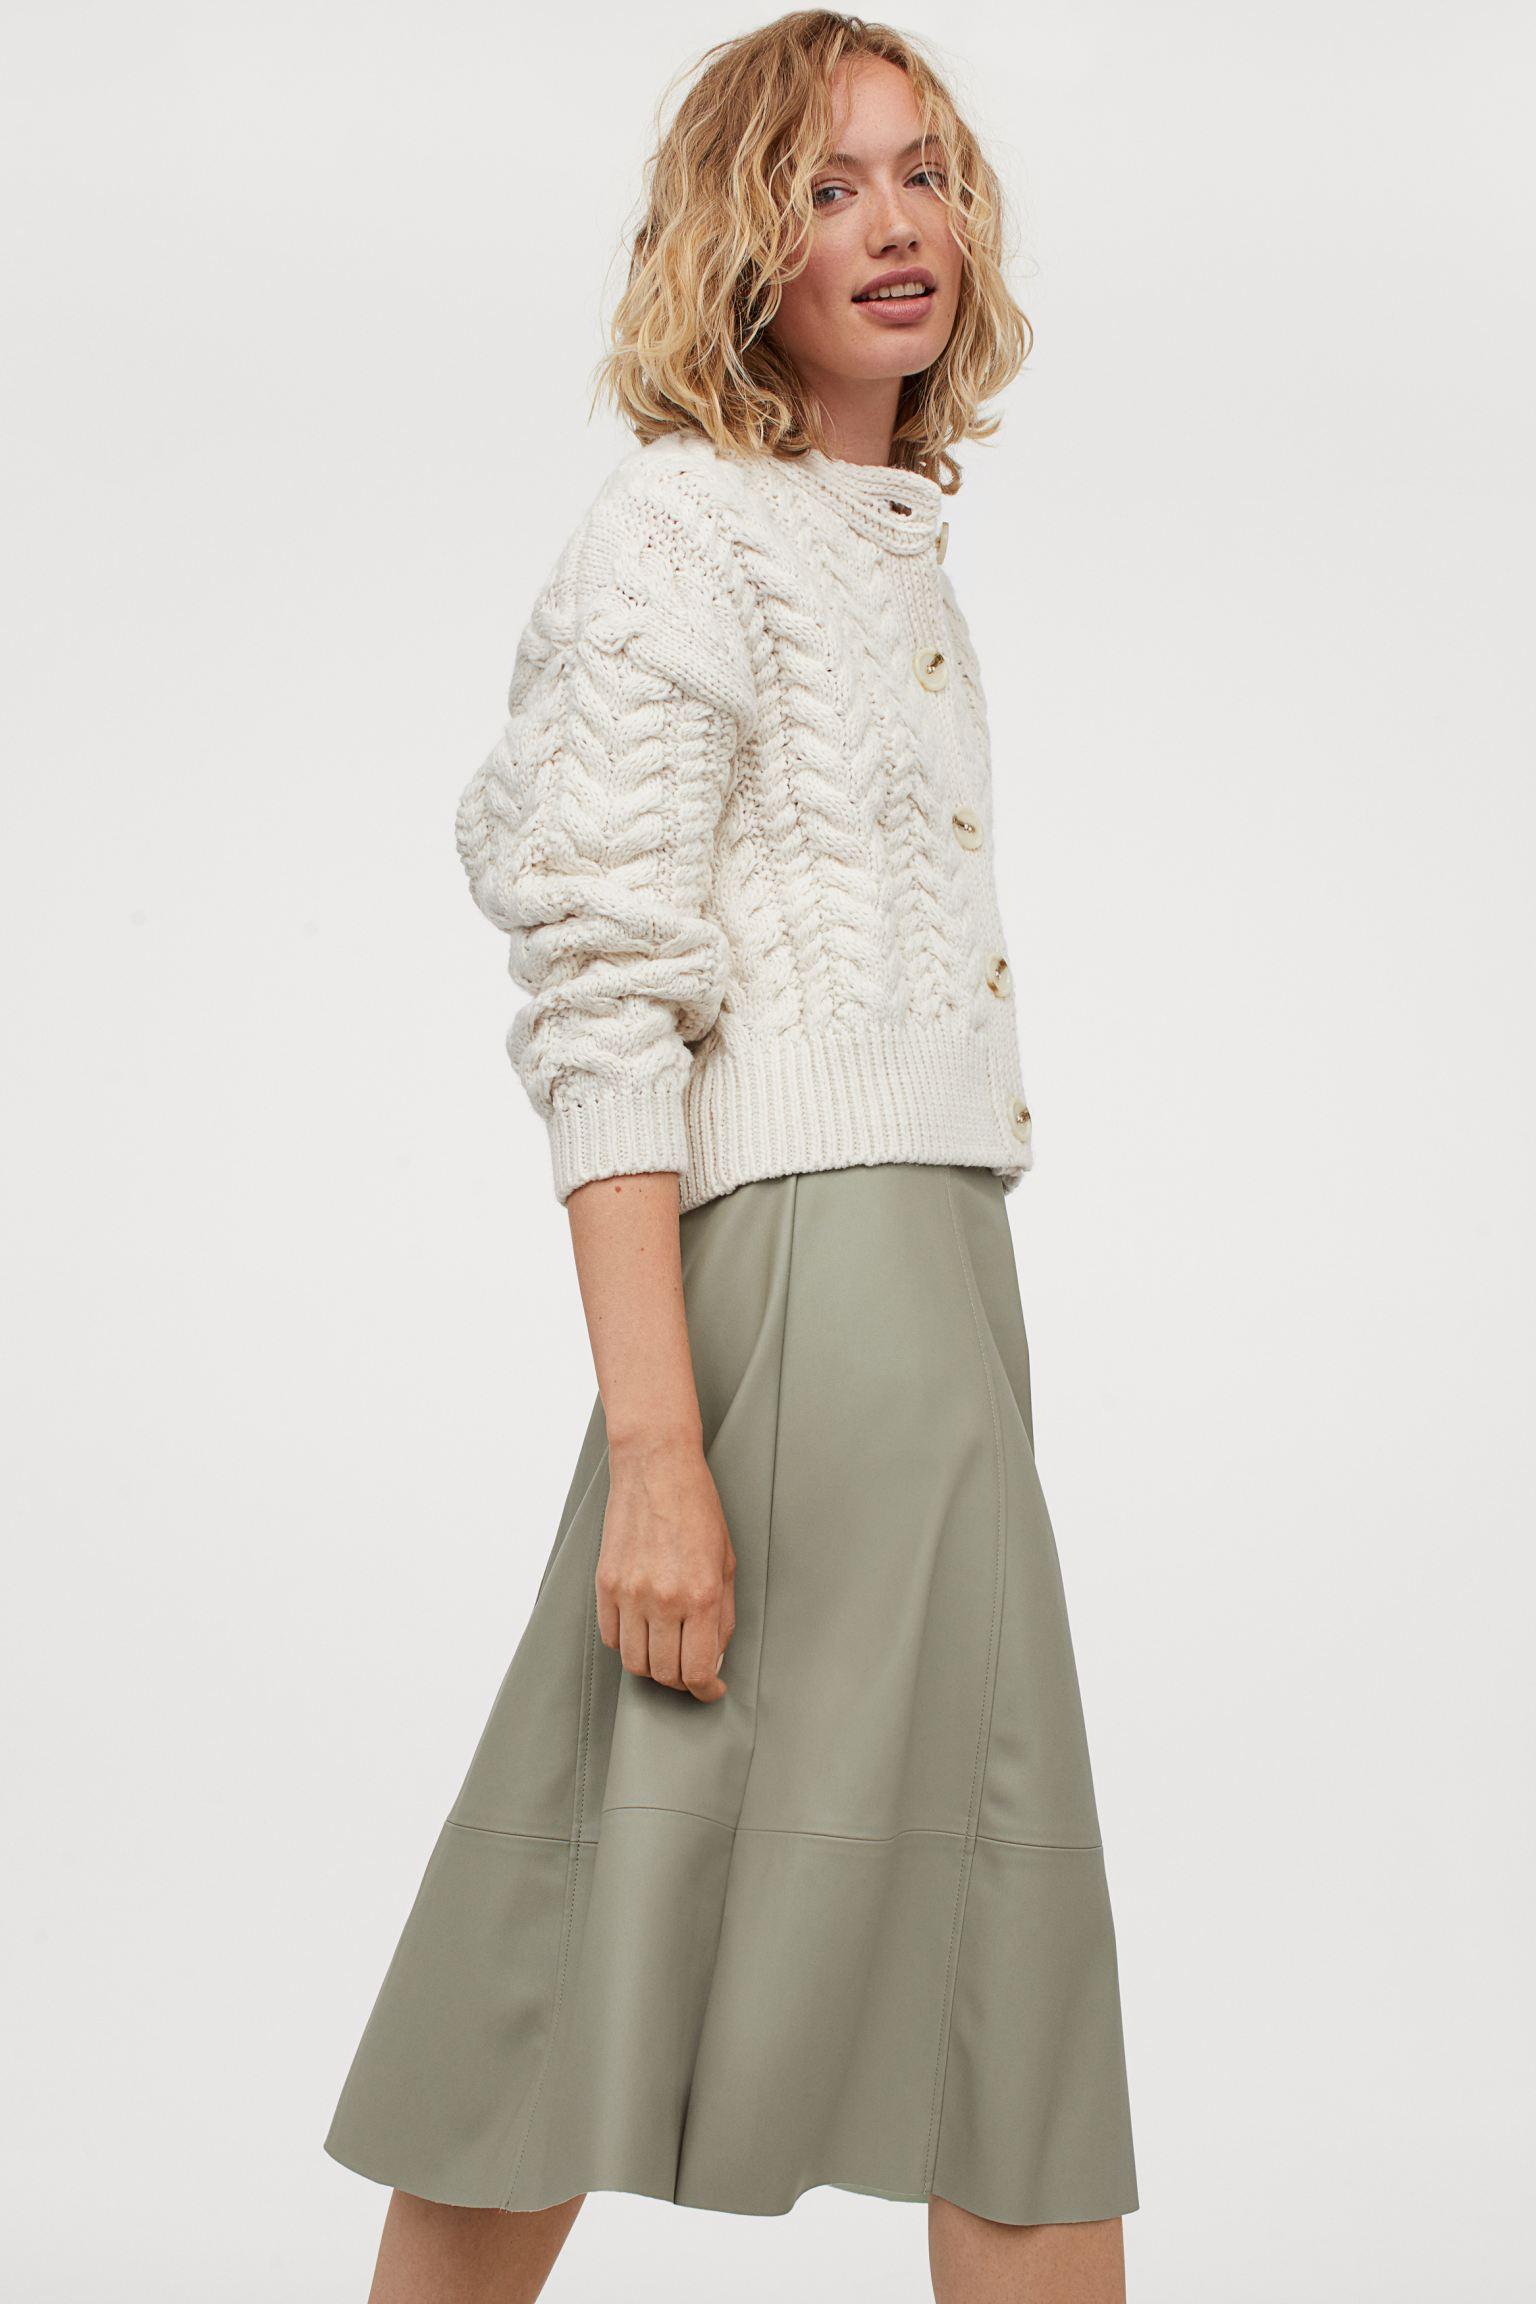 Falda midi con vuelo en tono khaki de piel sintética